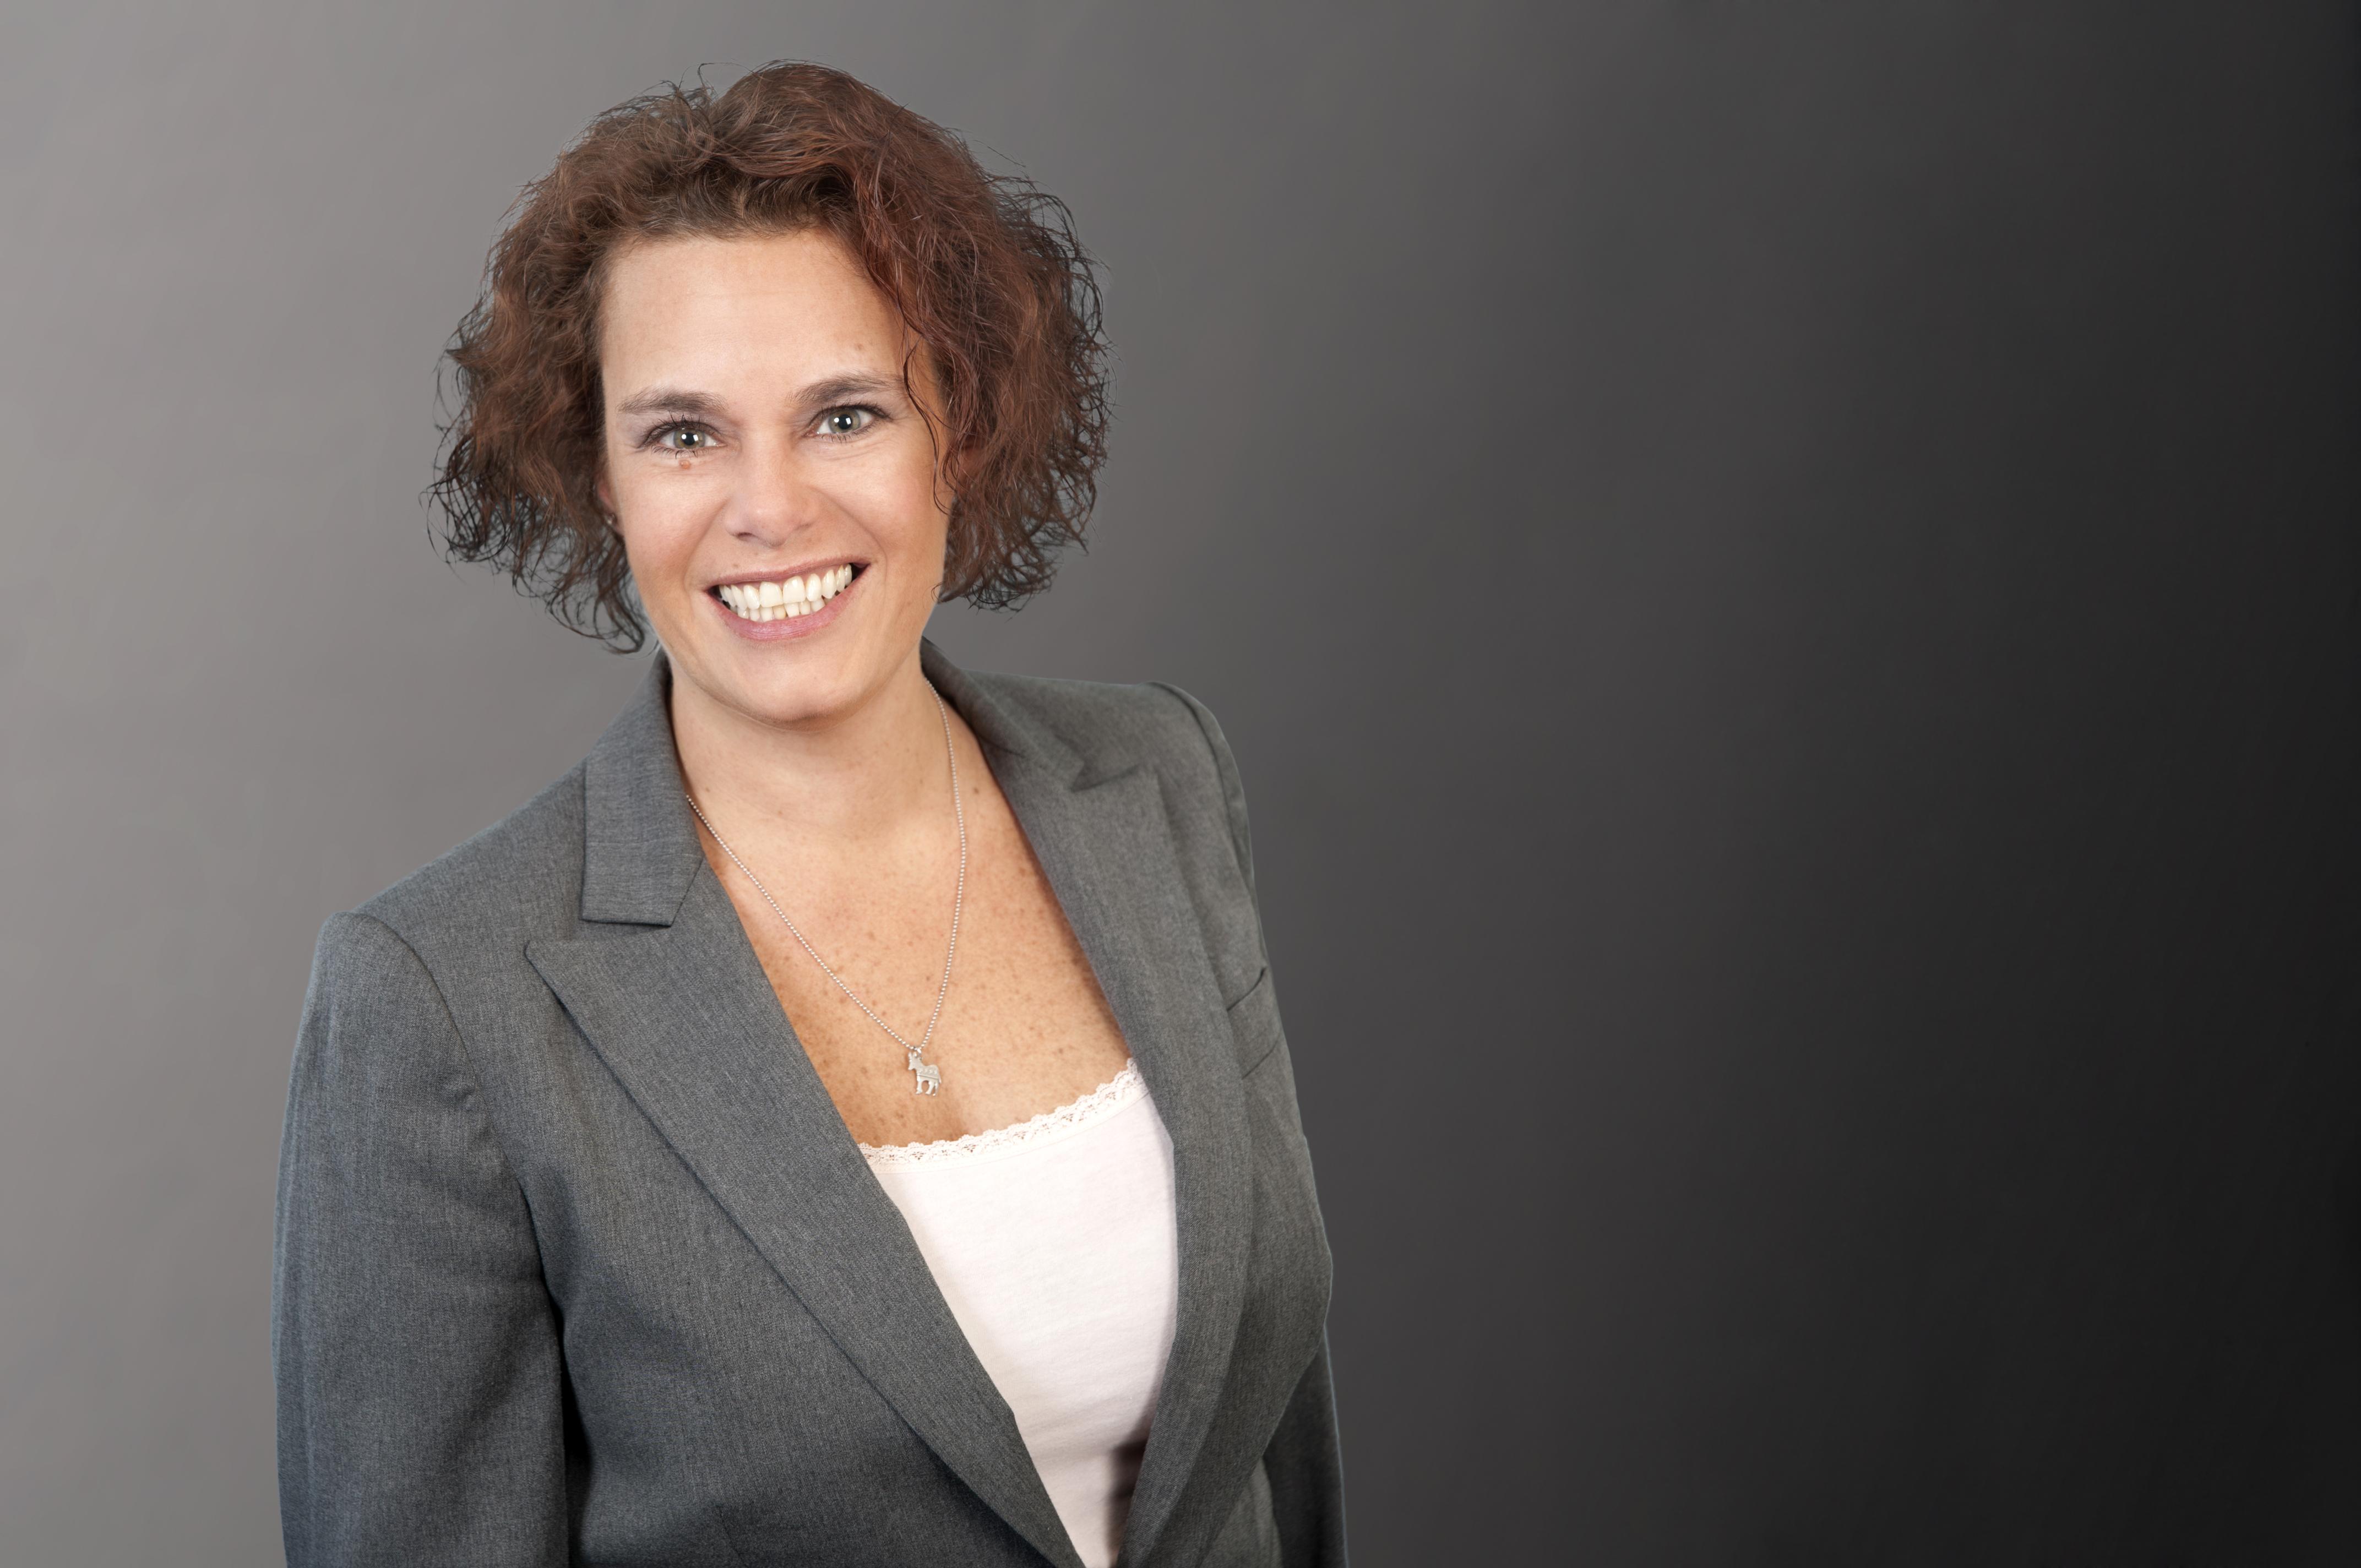 Mellisa Wagner